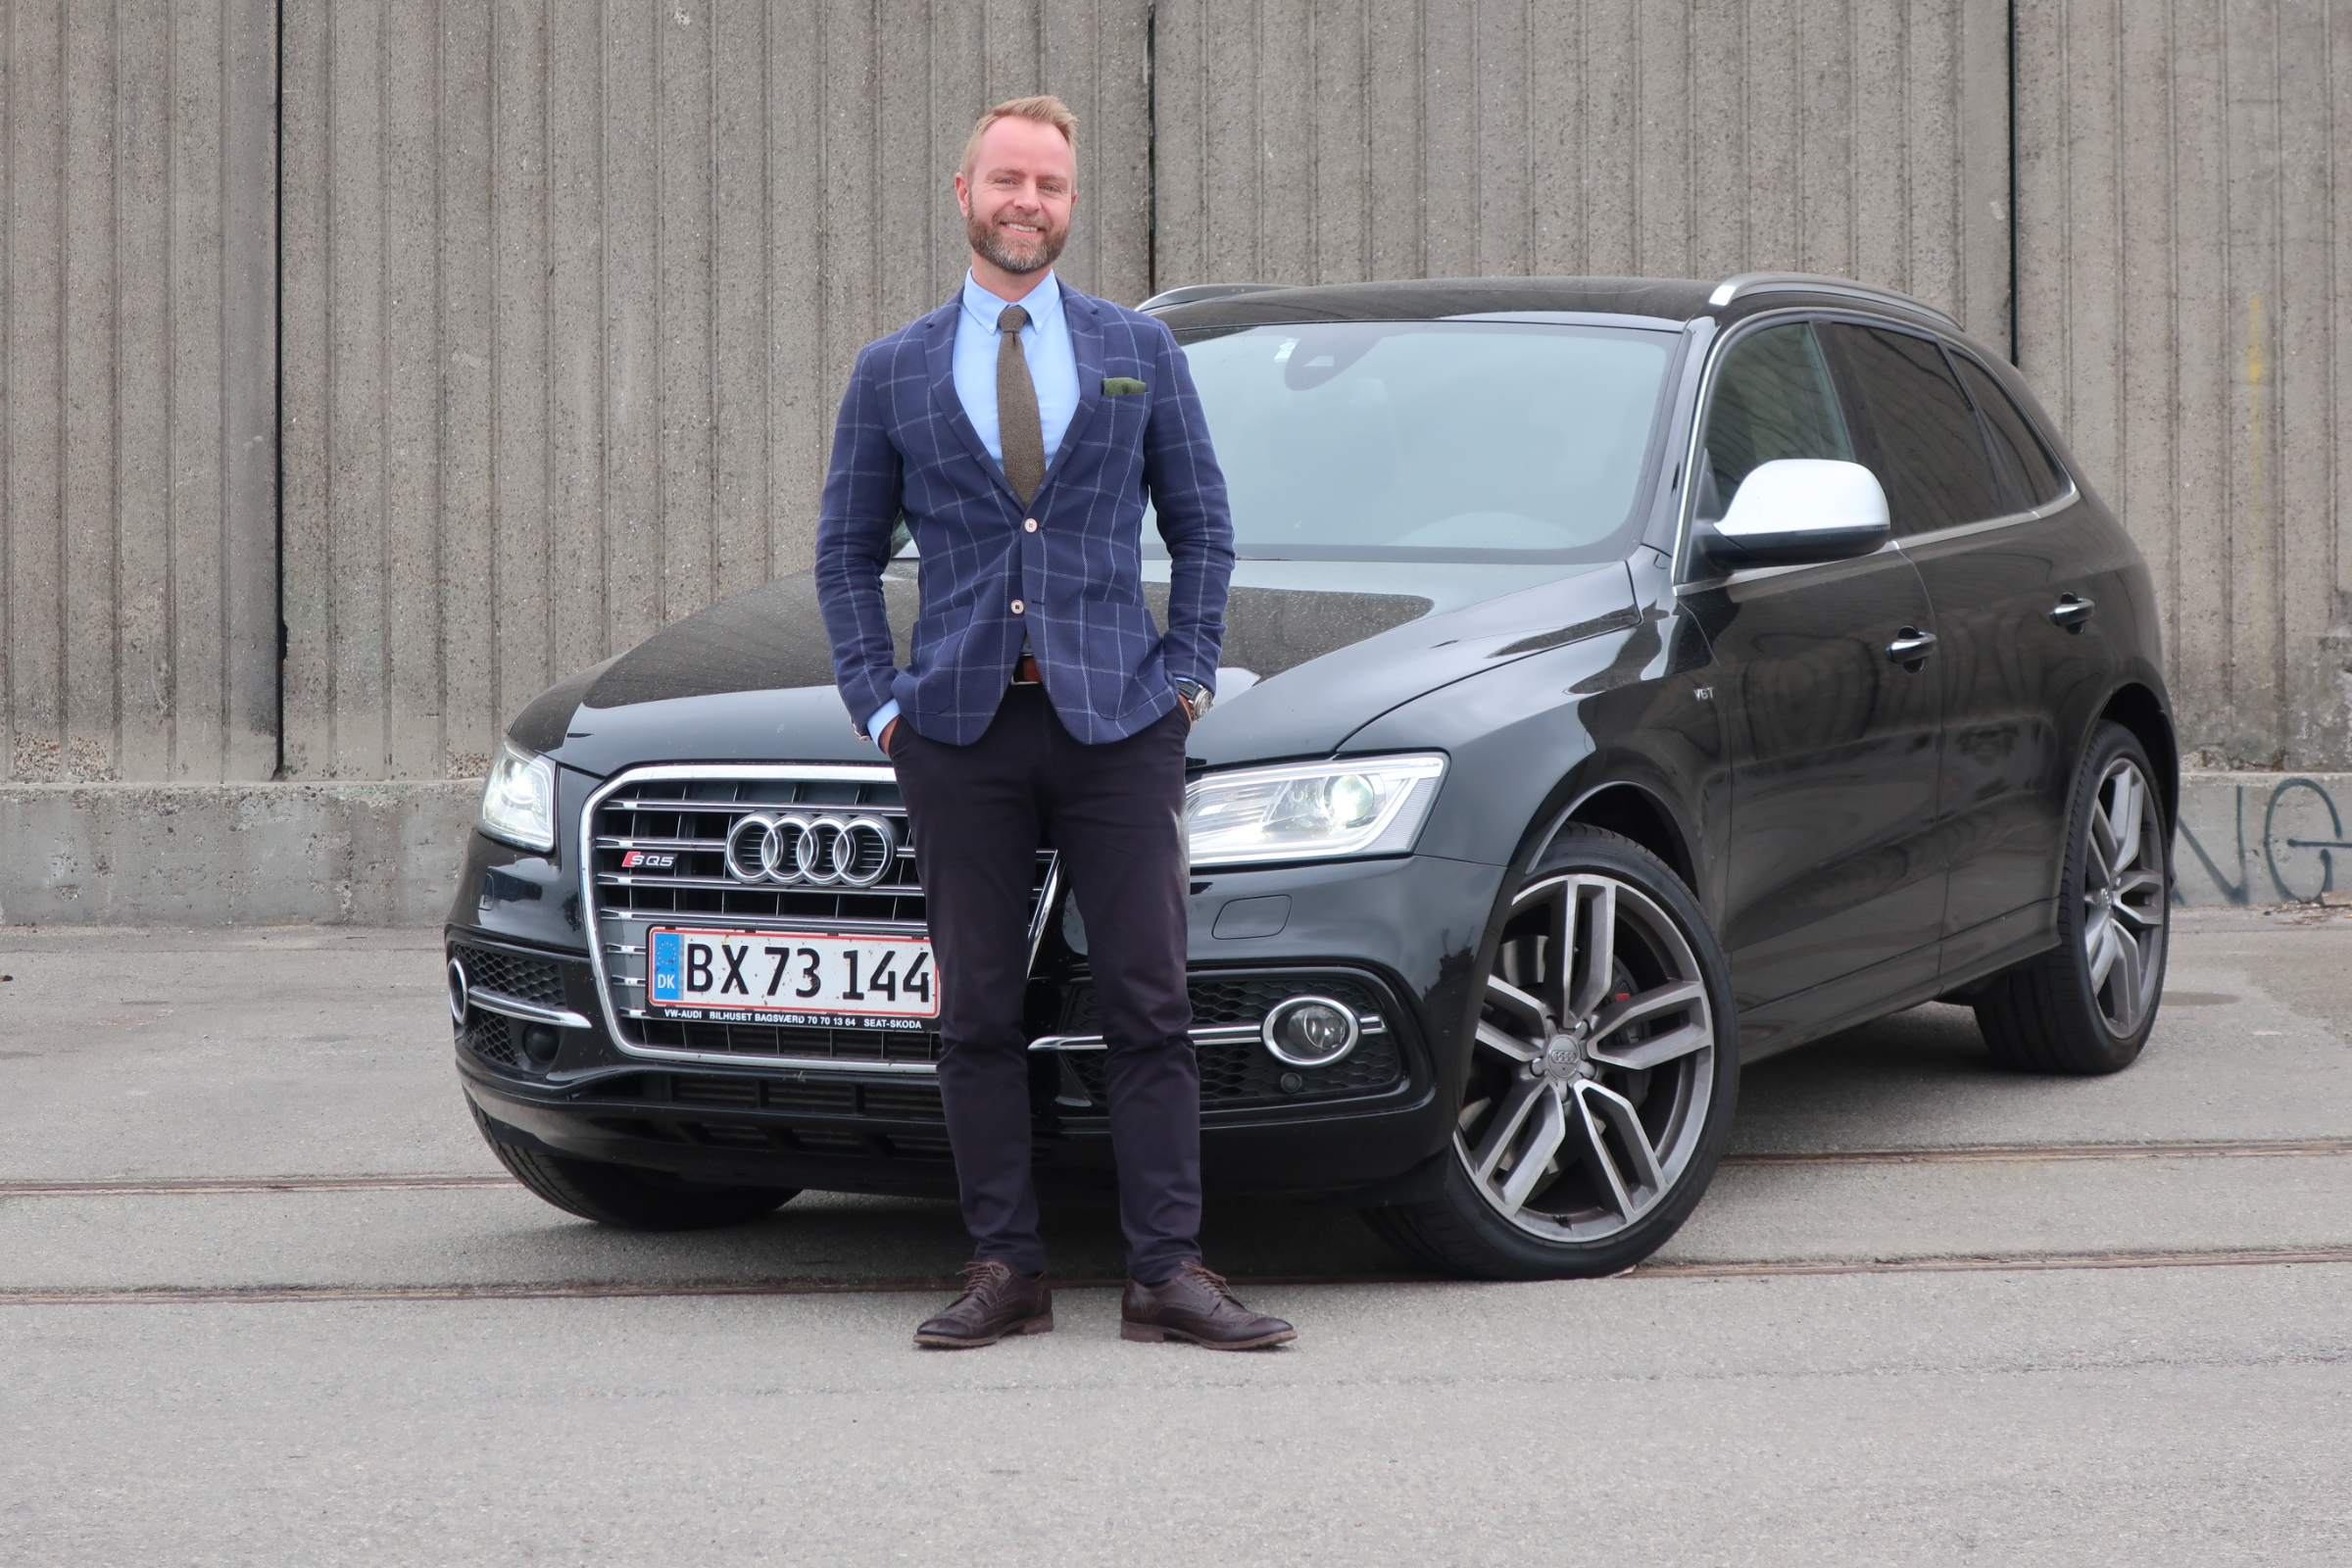 Mød ugens profil Jesper Bergstrøm